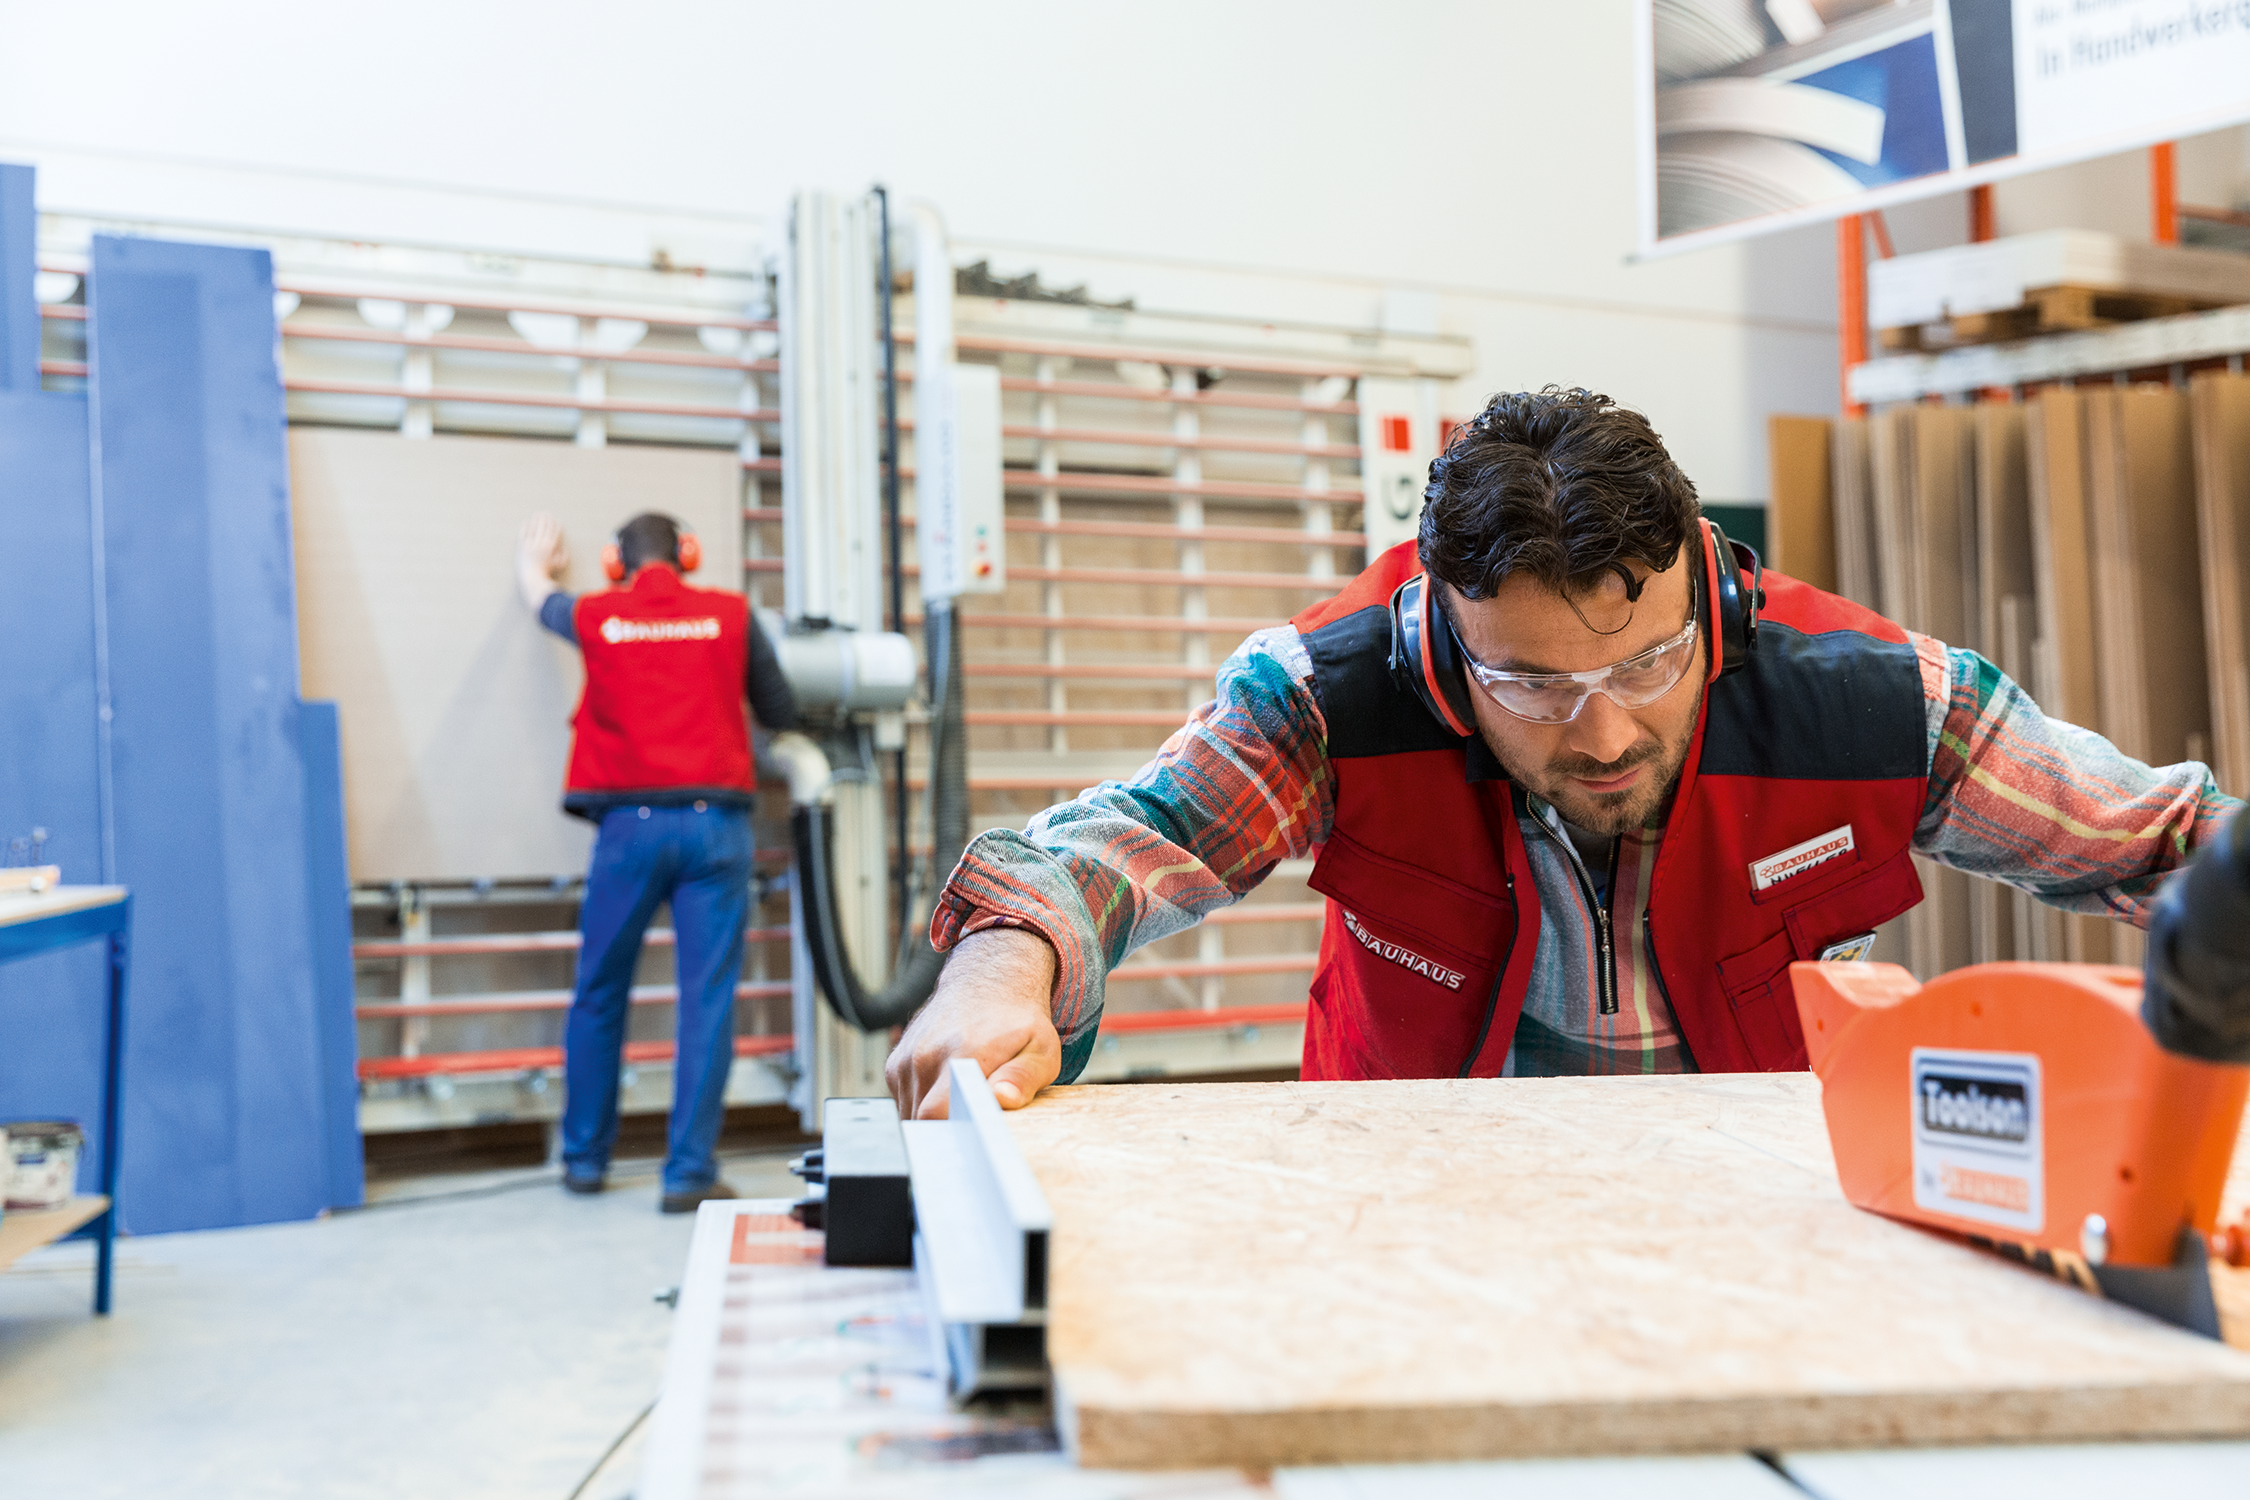 Bauhaus küchenarbeitsplatte ~ Perfekt zugeschnitten: holz schneiden die bauhaus fachberater euch